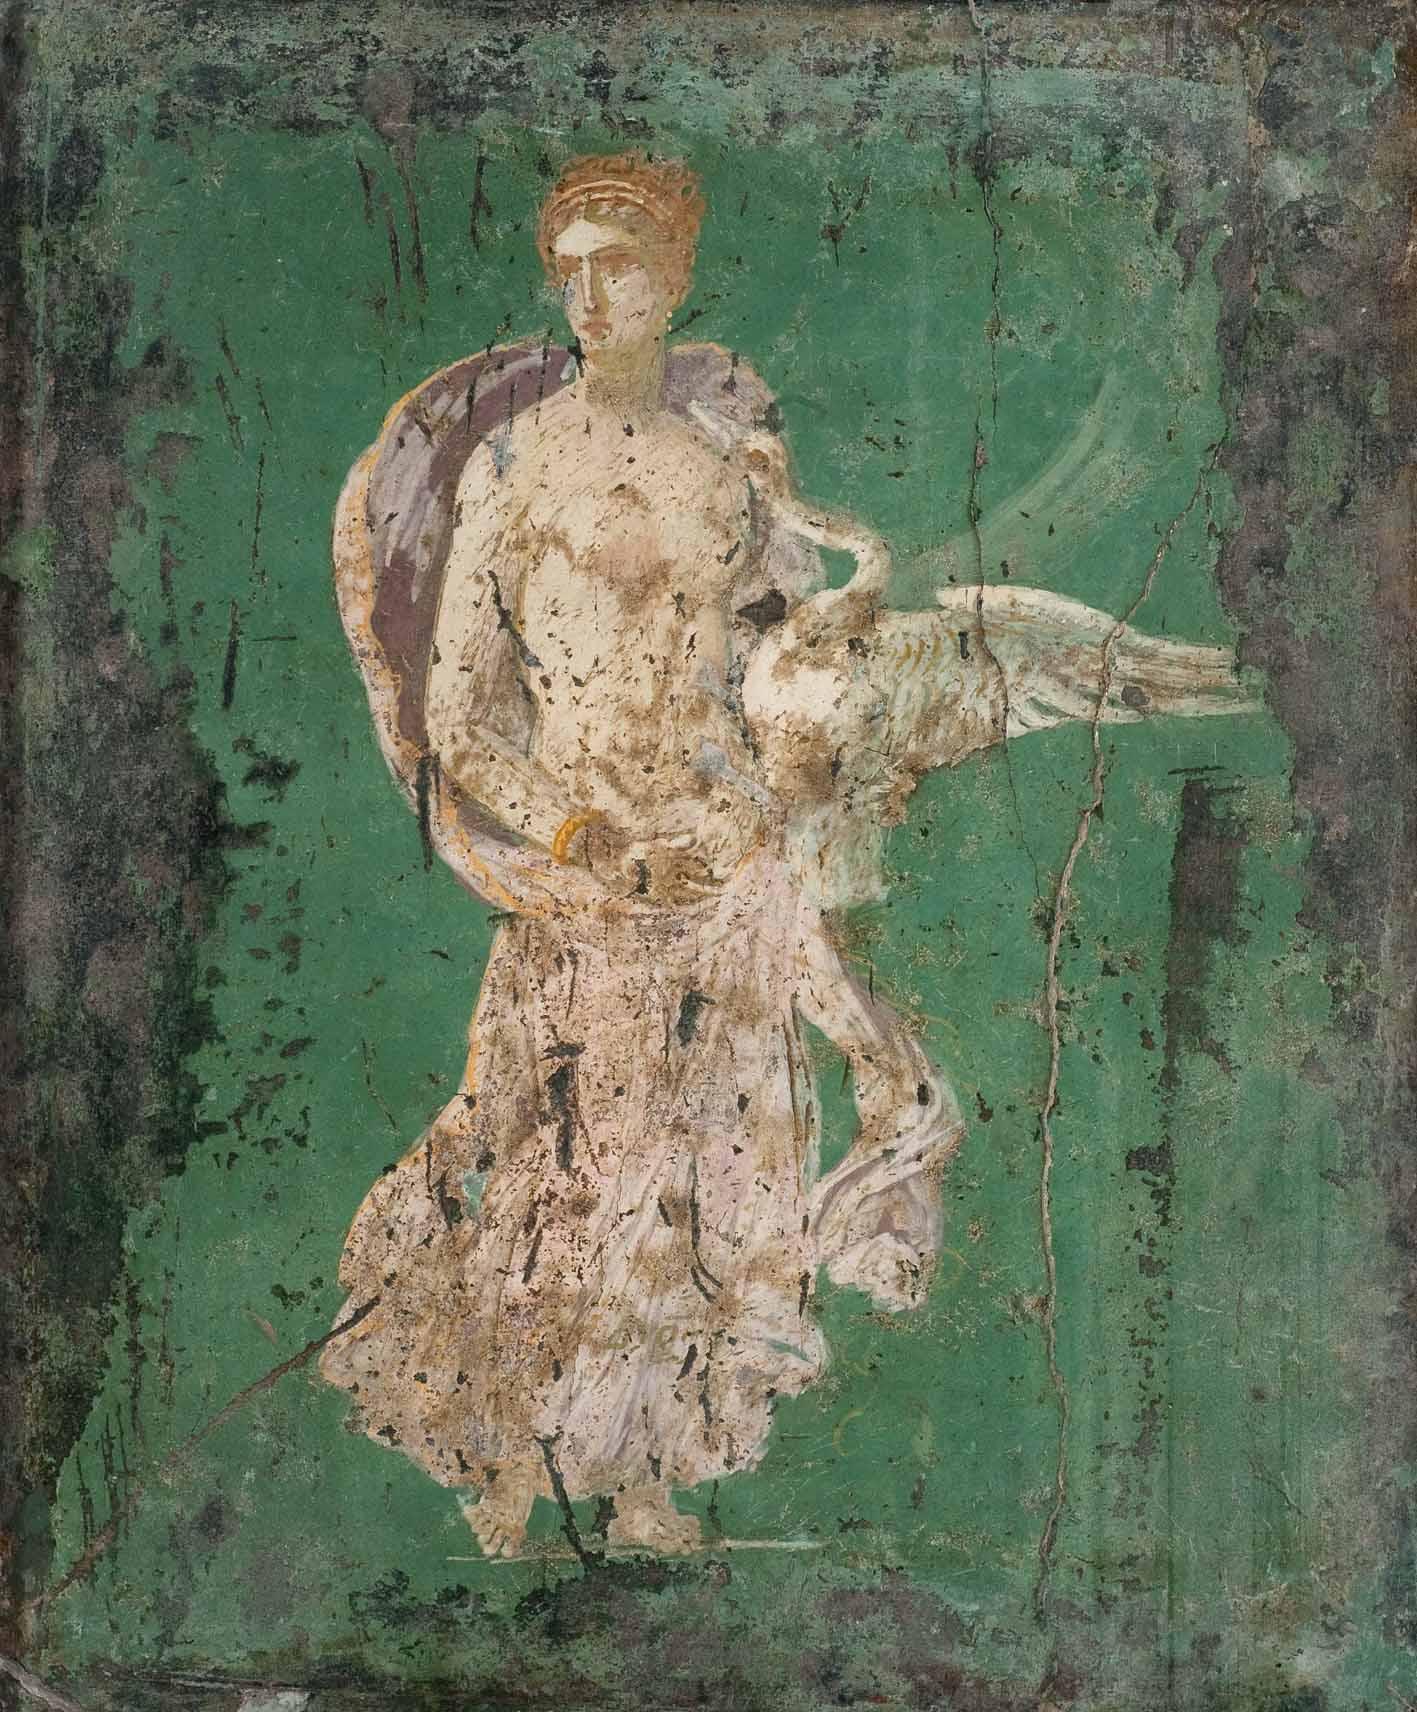 Ovídio: amores e mitos Artes & contextos 2 leda e il cigno